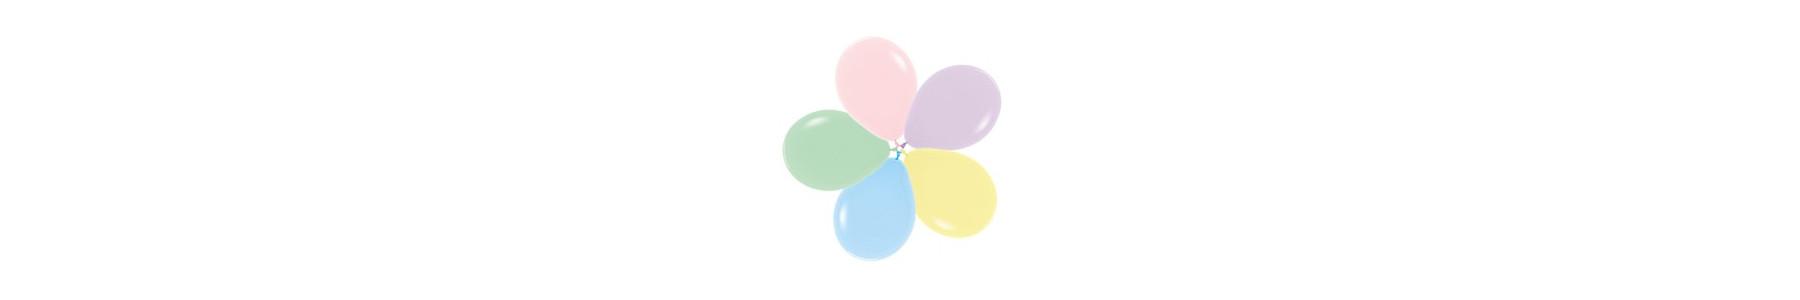 Colectia de baloane rotunde SEMPERTEX Fashion Pastel